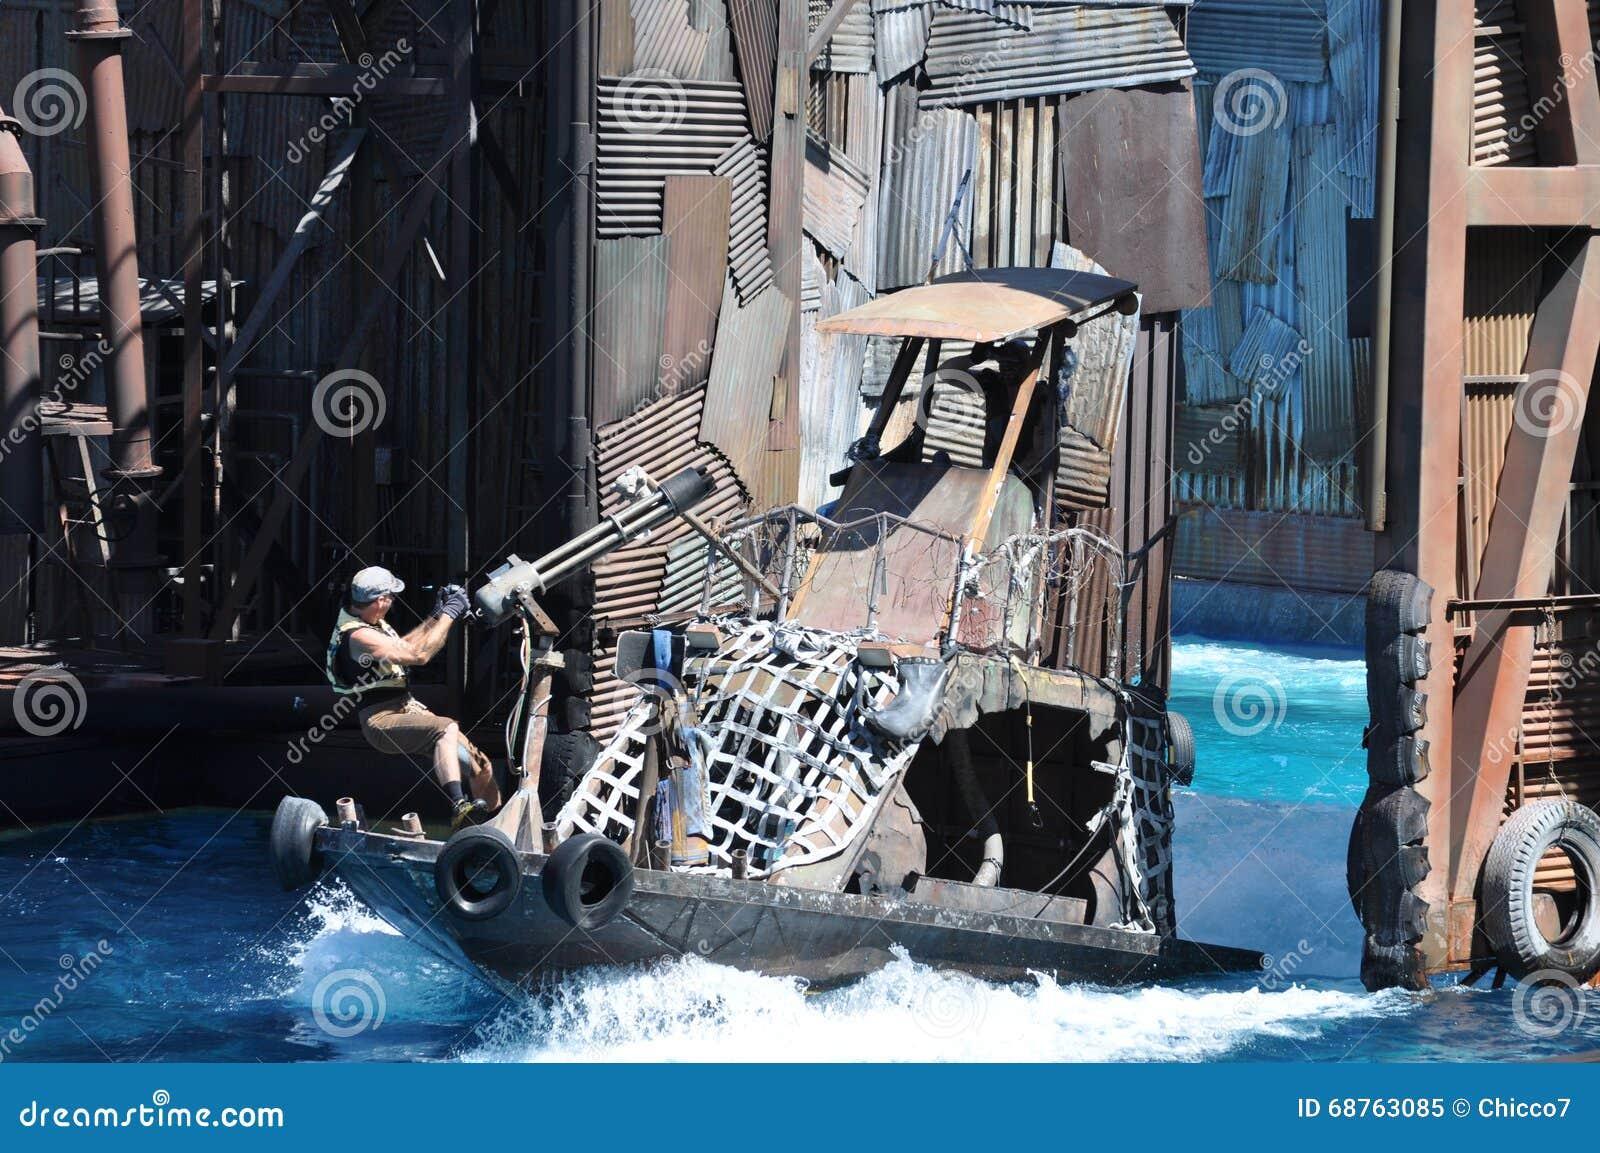 Waterworld show at Universal Studios Holliwood